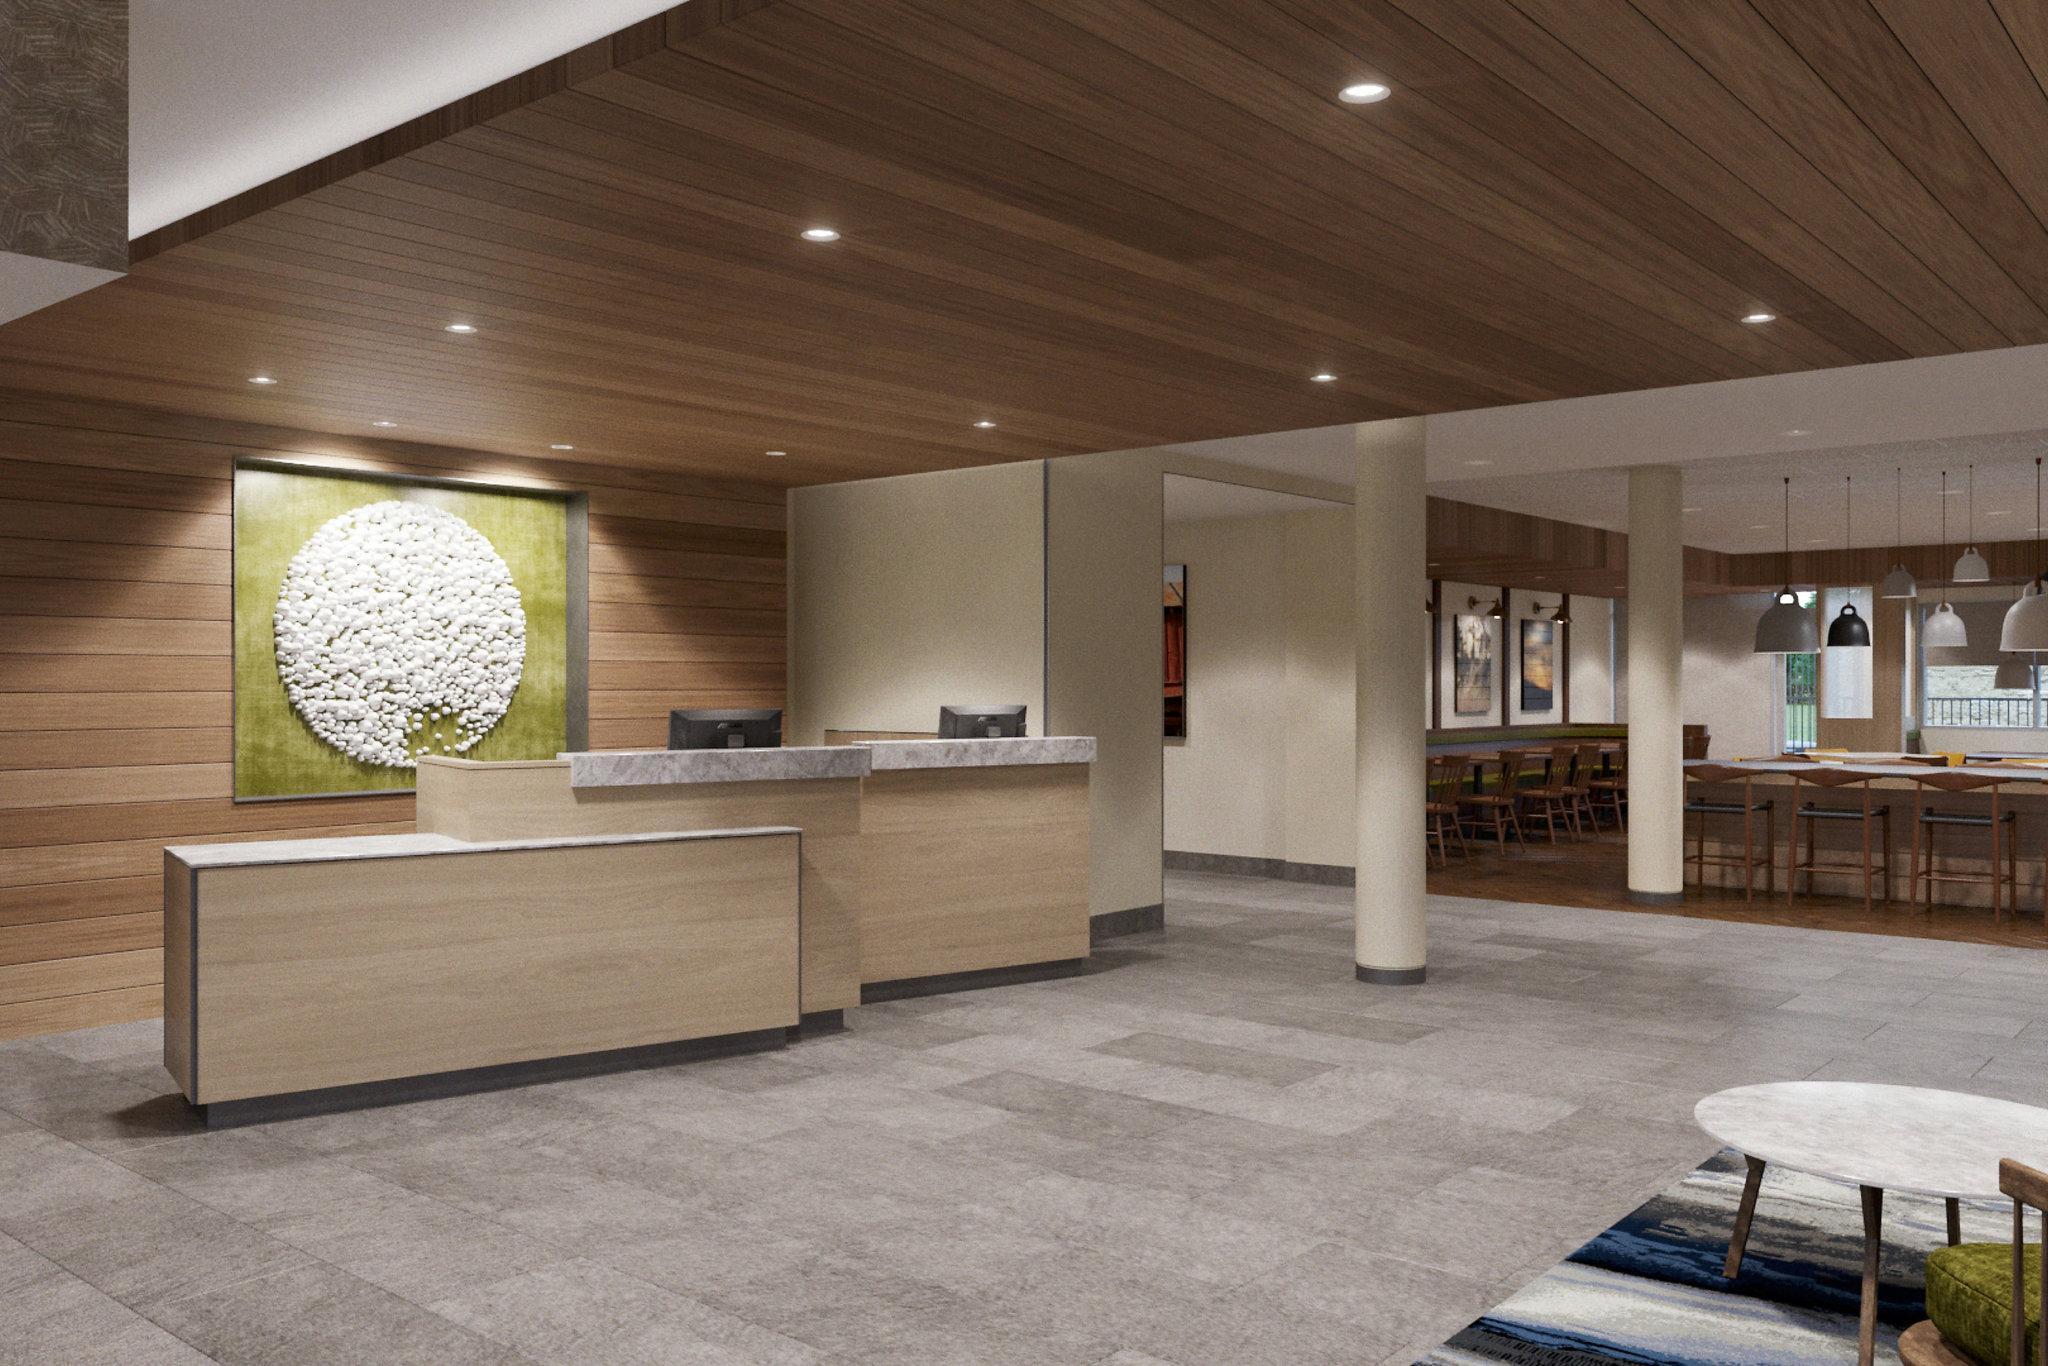 Fairfield Inn And Suites Salina